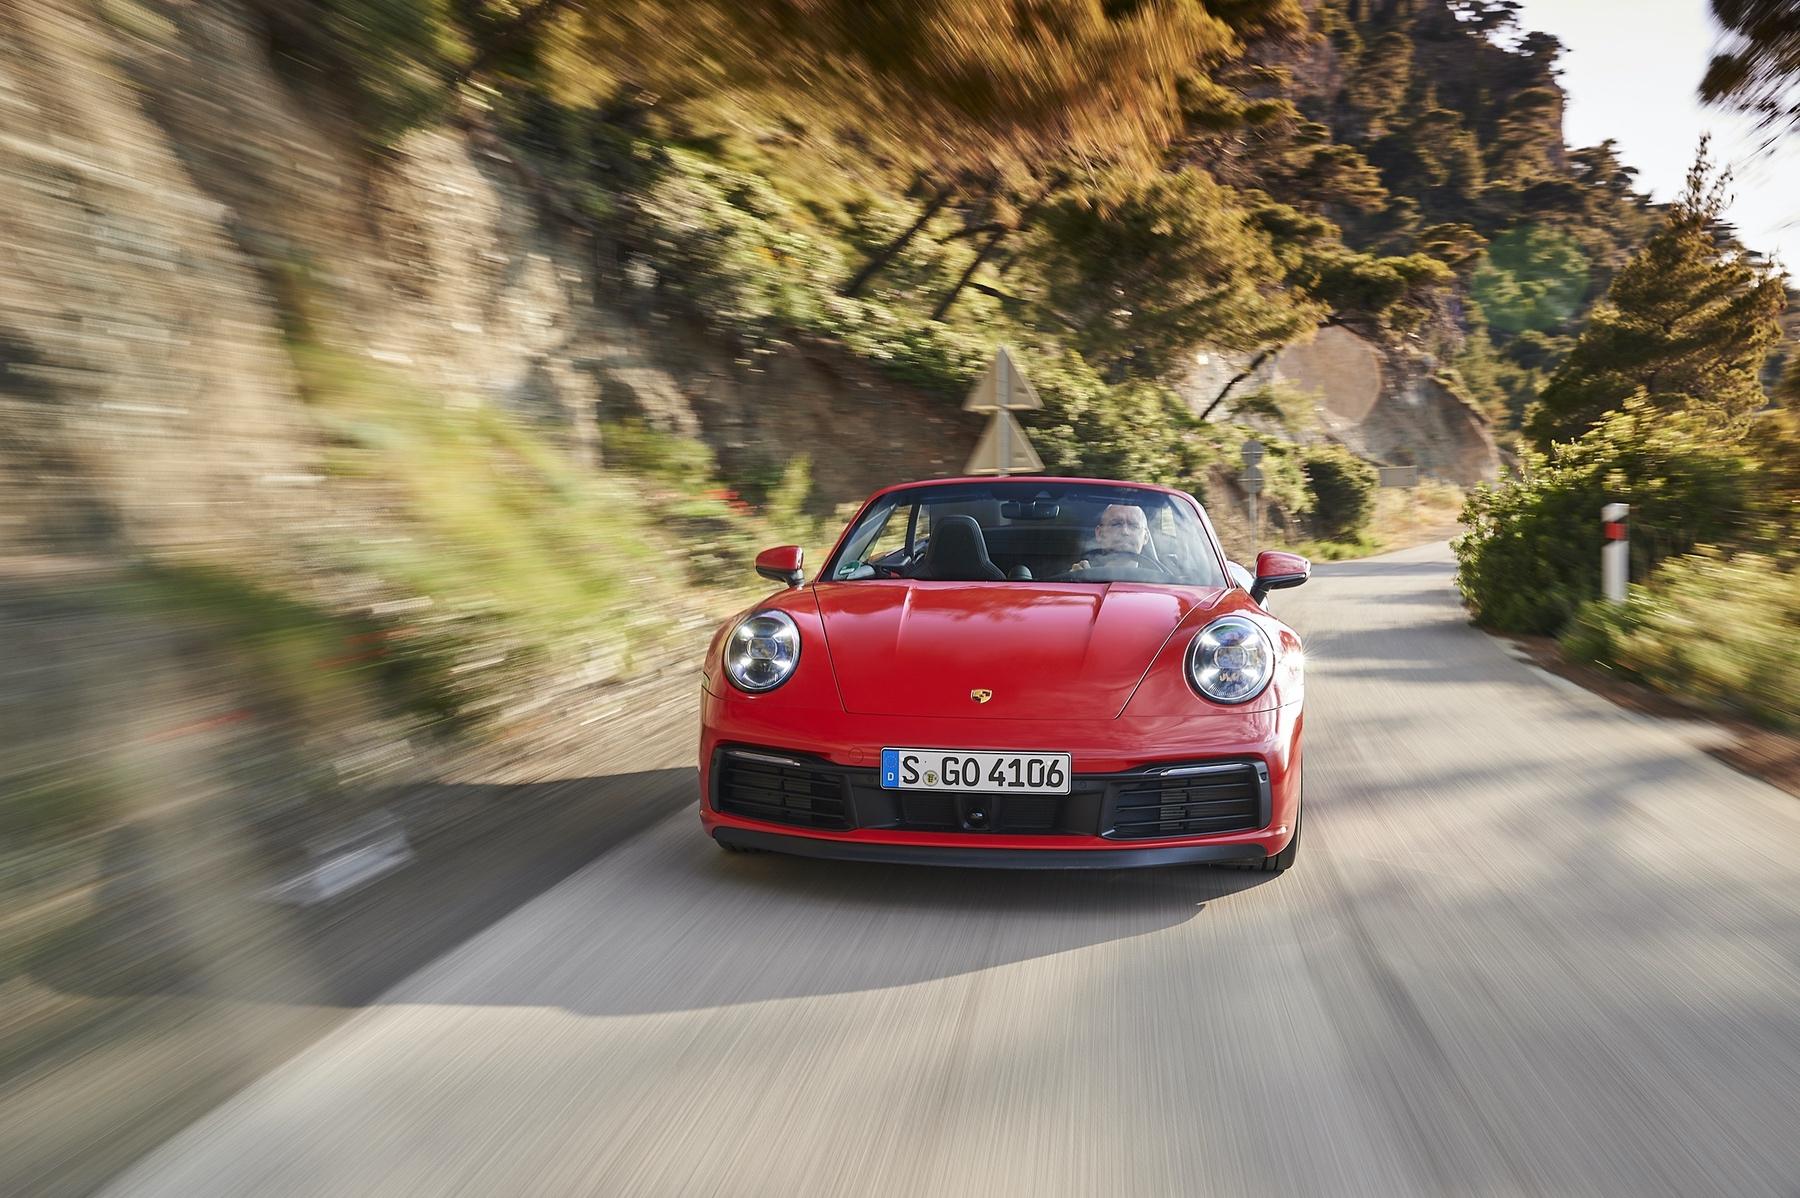 Test_Drive_Porsche_911_Athens_0126